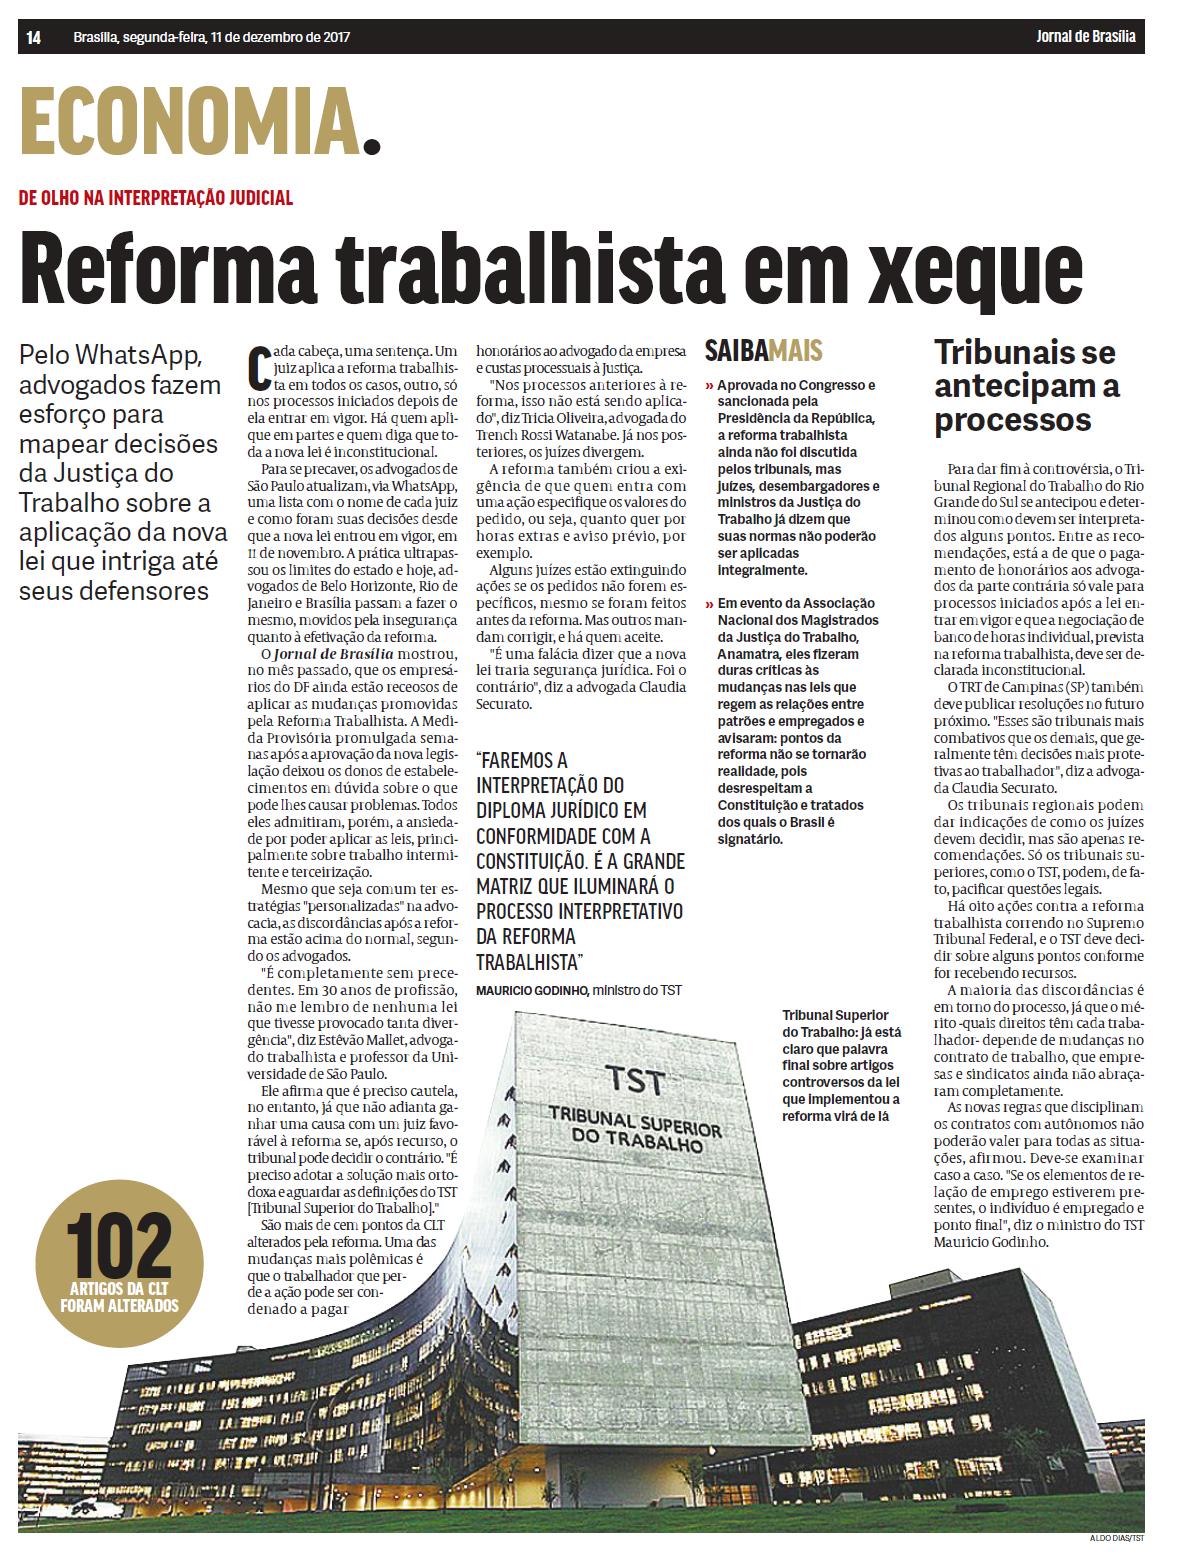 Jornal_de_Brasília_Reforma_trabalhista